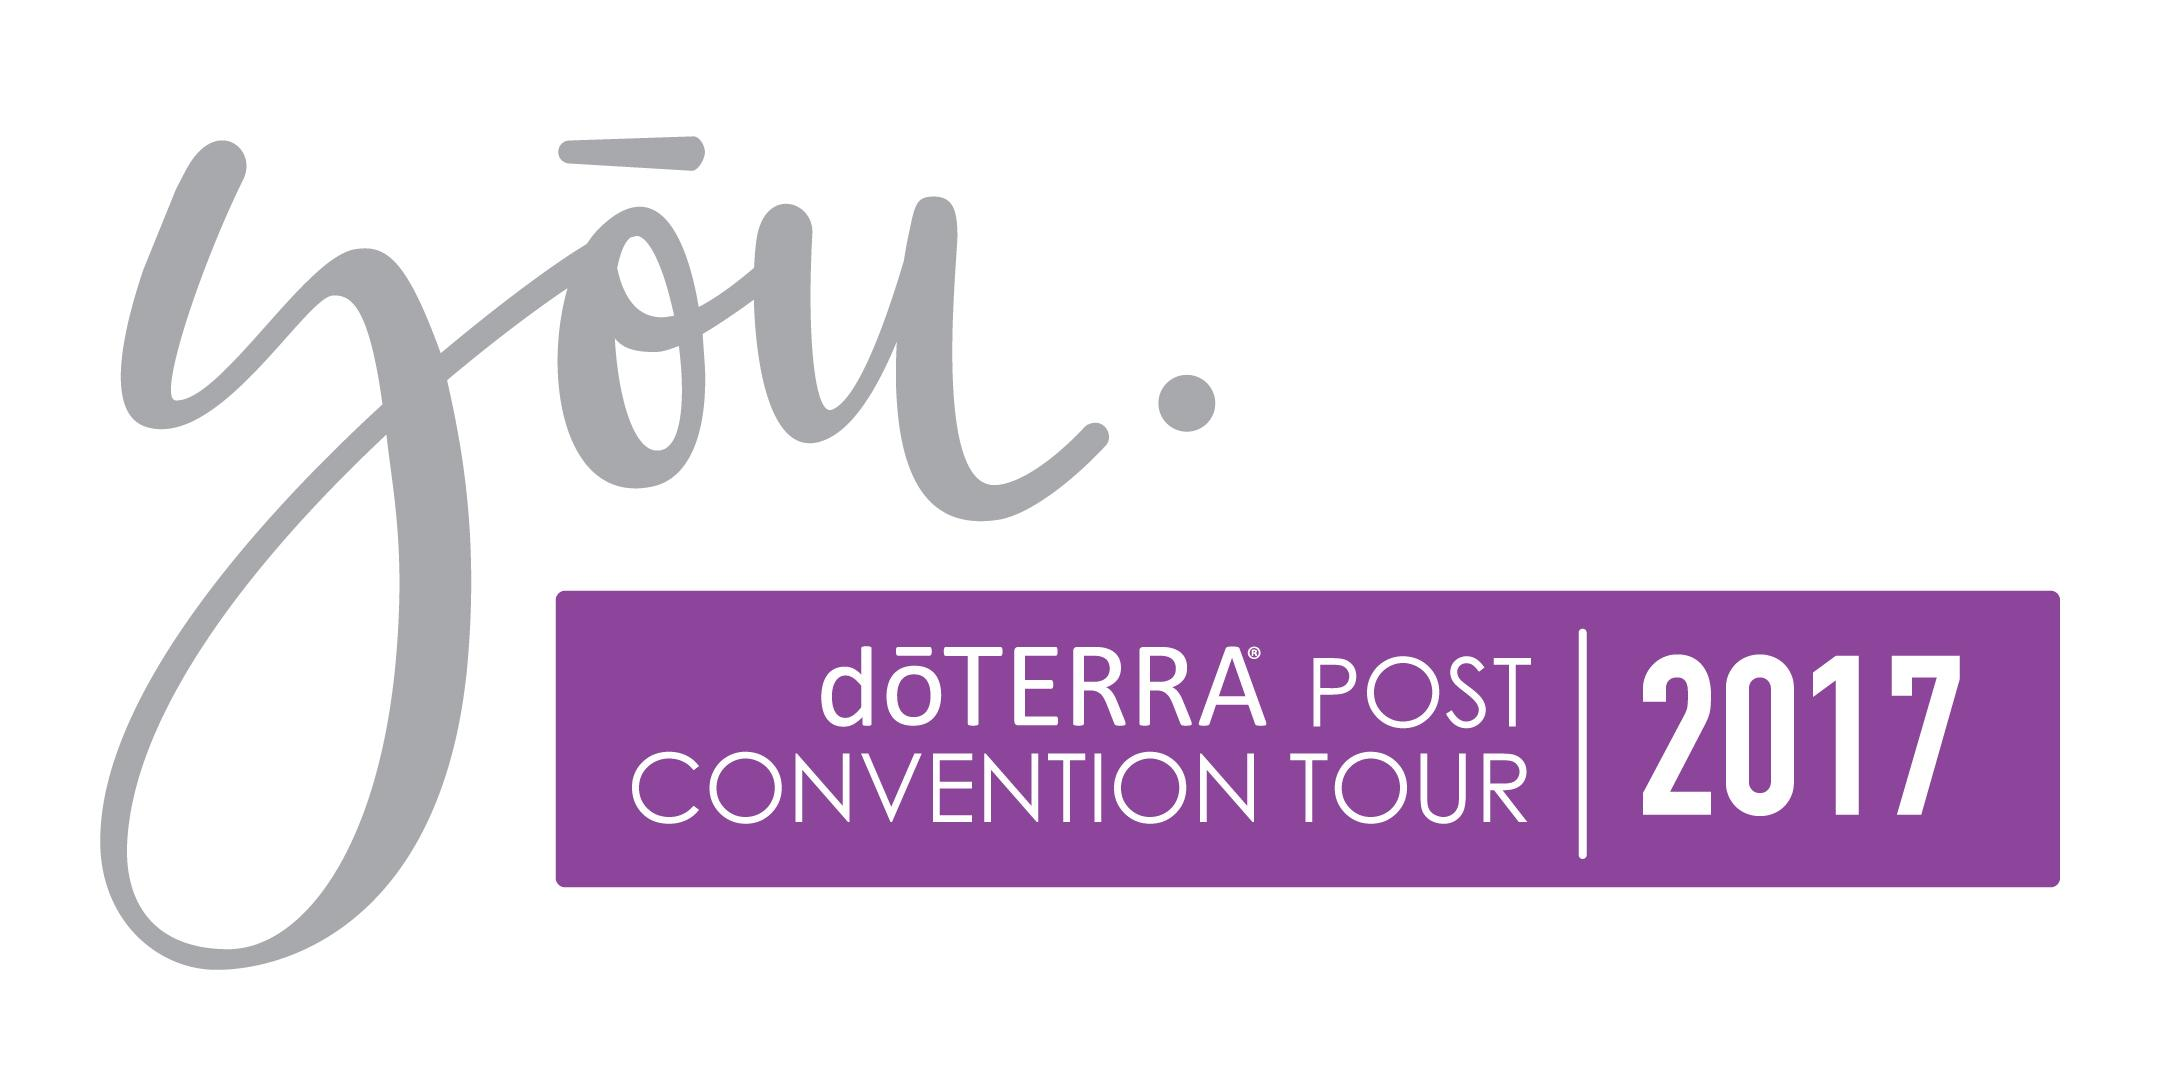 doTERRA yōu. Post Convention Tour: Albuquerque, NM